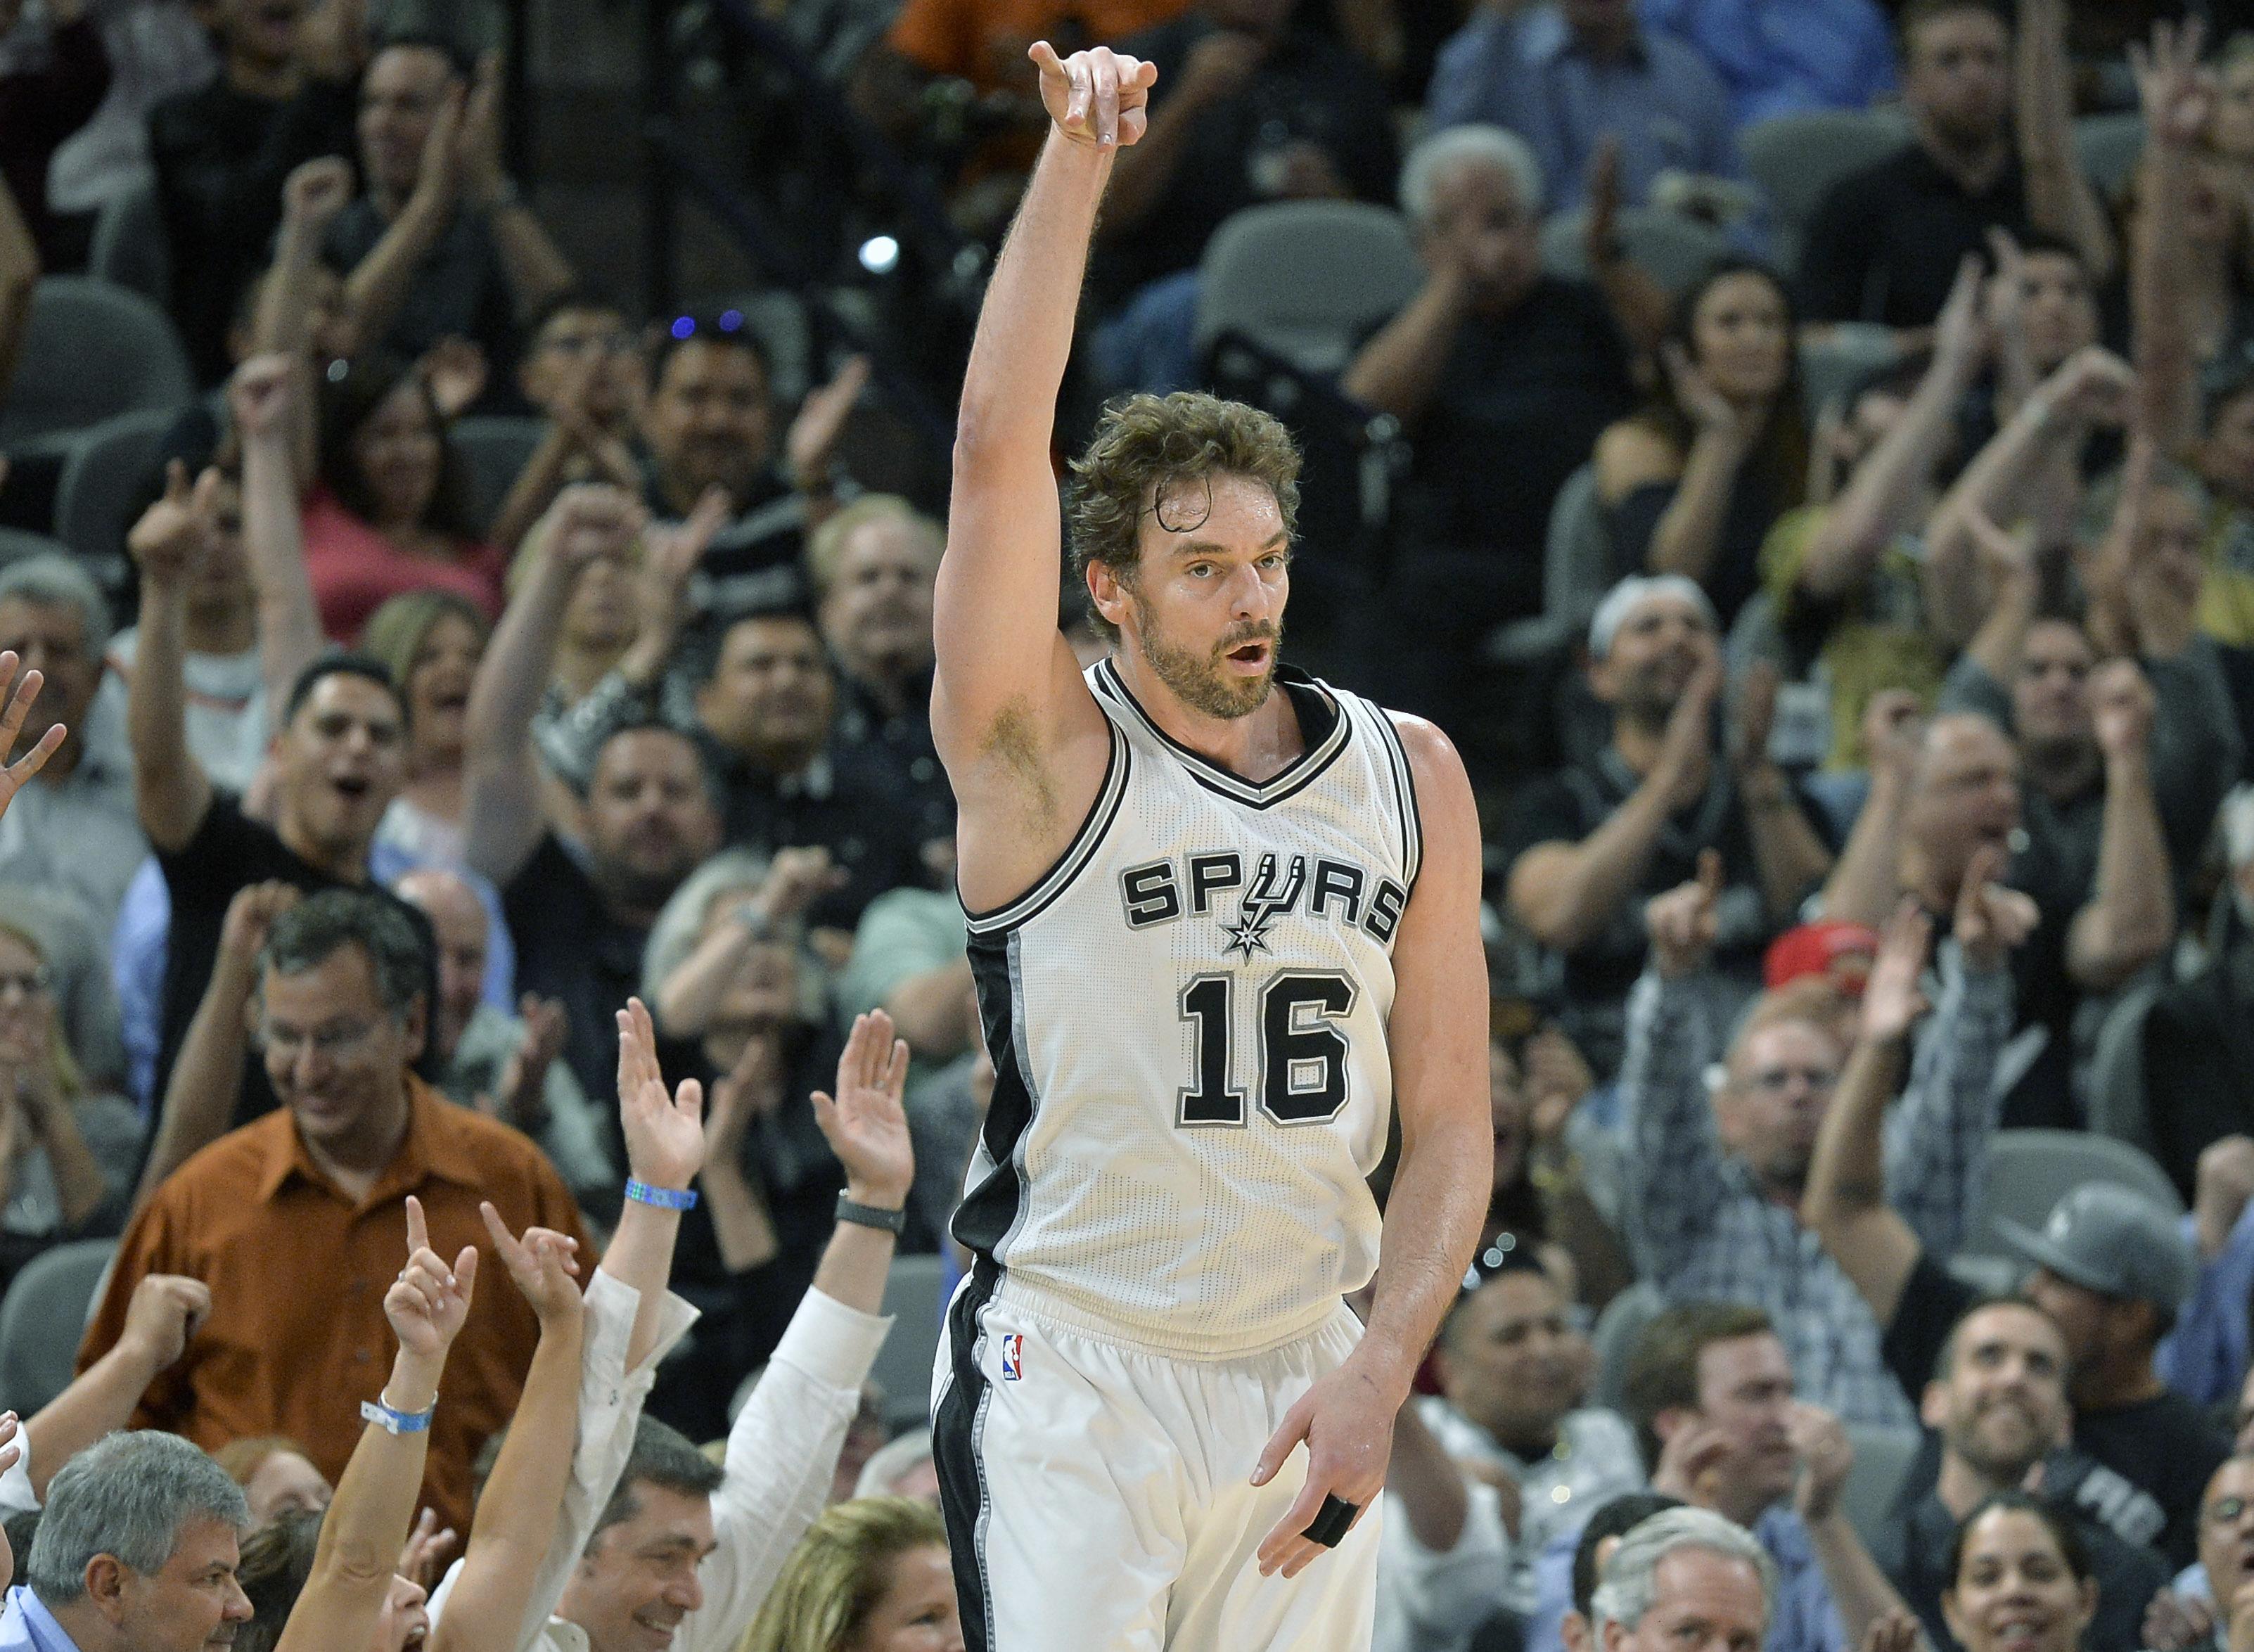 Spurs_paus_evolution_basketball_65948